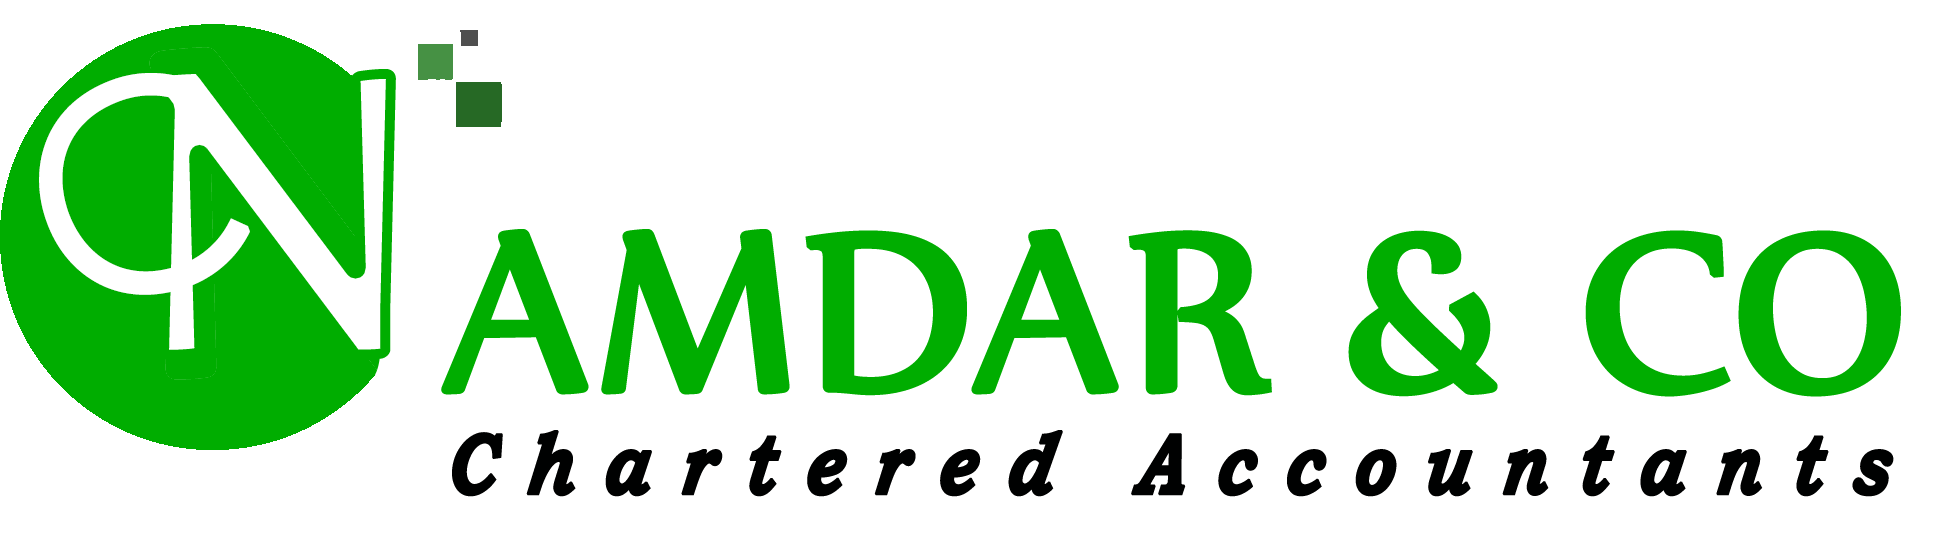 Clientle | Namdar & Co